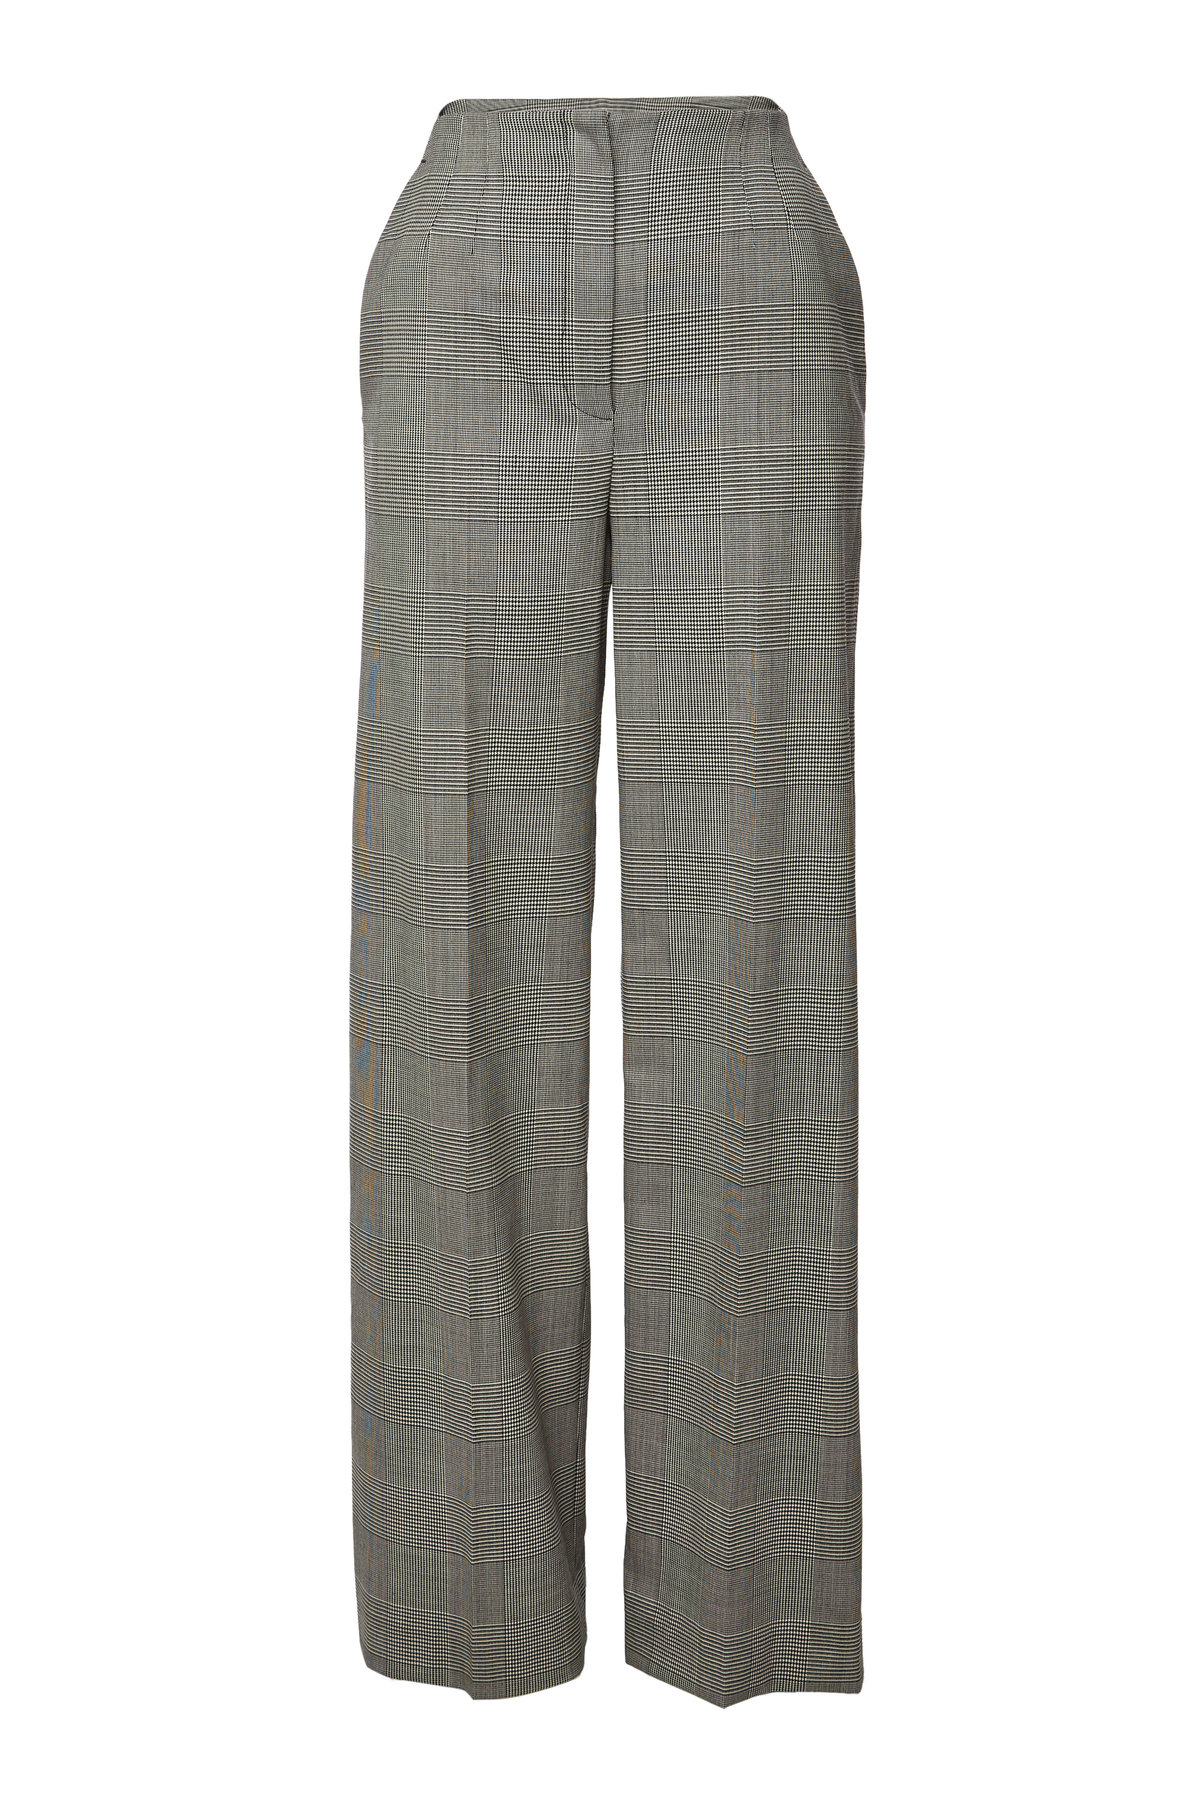 Proenza Schouler - Plaid Wide Leg Wool Pants